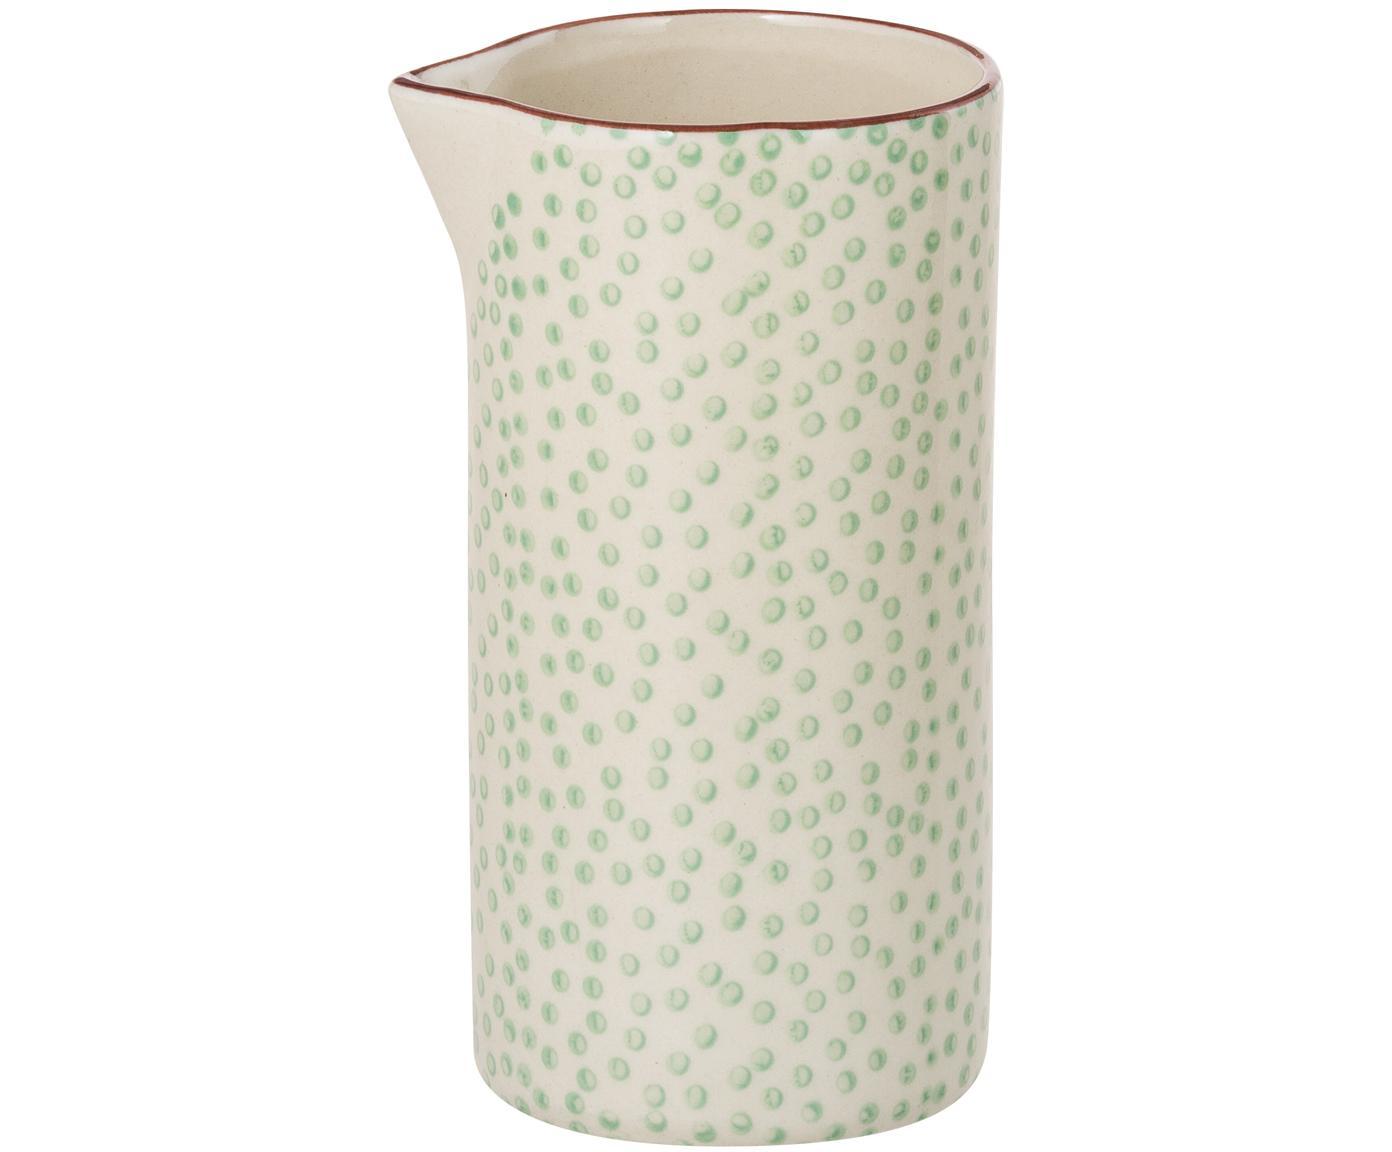 Brocca da latte dipinta a mano Patrizia, Terracotta, Verde, crema, viola, Ø 6 x Alt. 12 cm